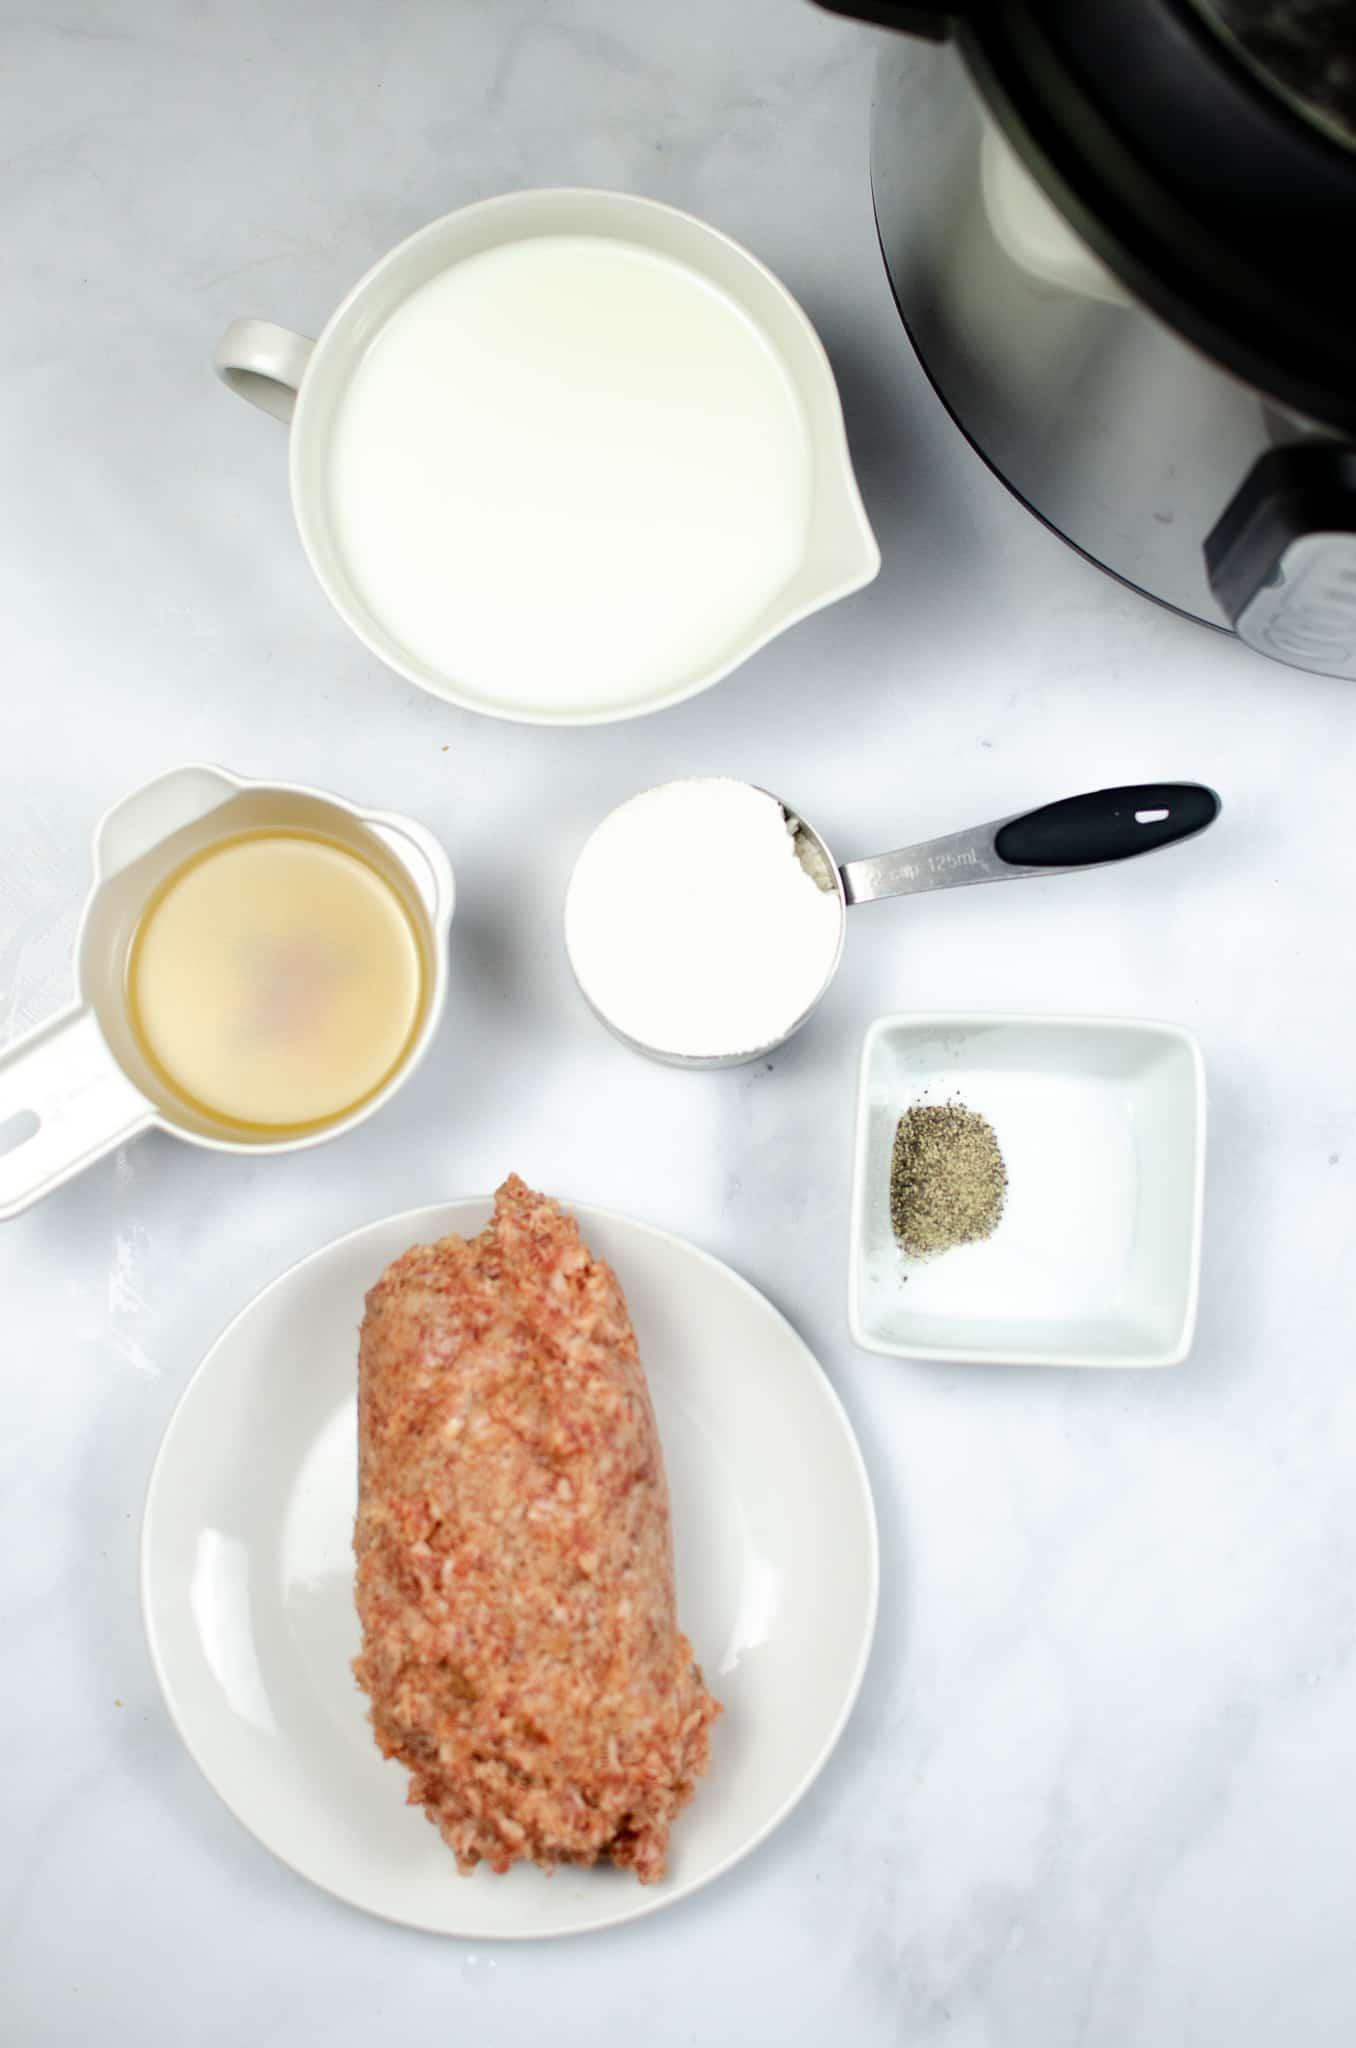 instant pot sausage gravy ingredients in ingredient dishes